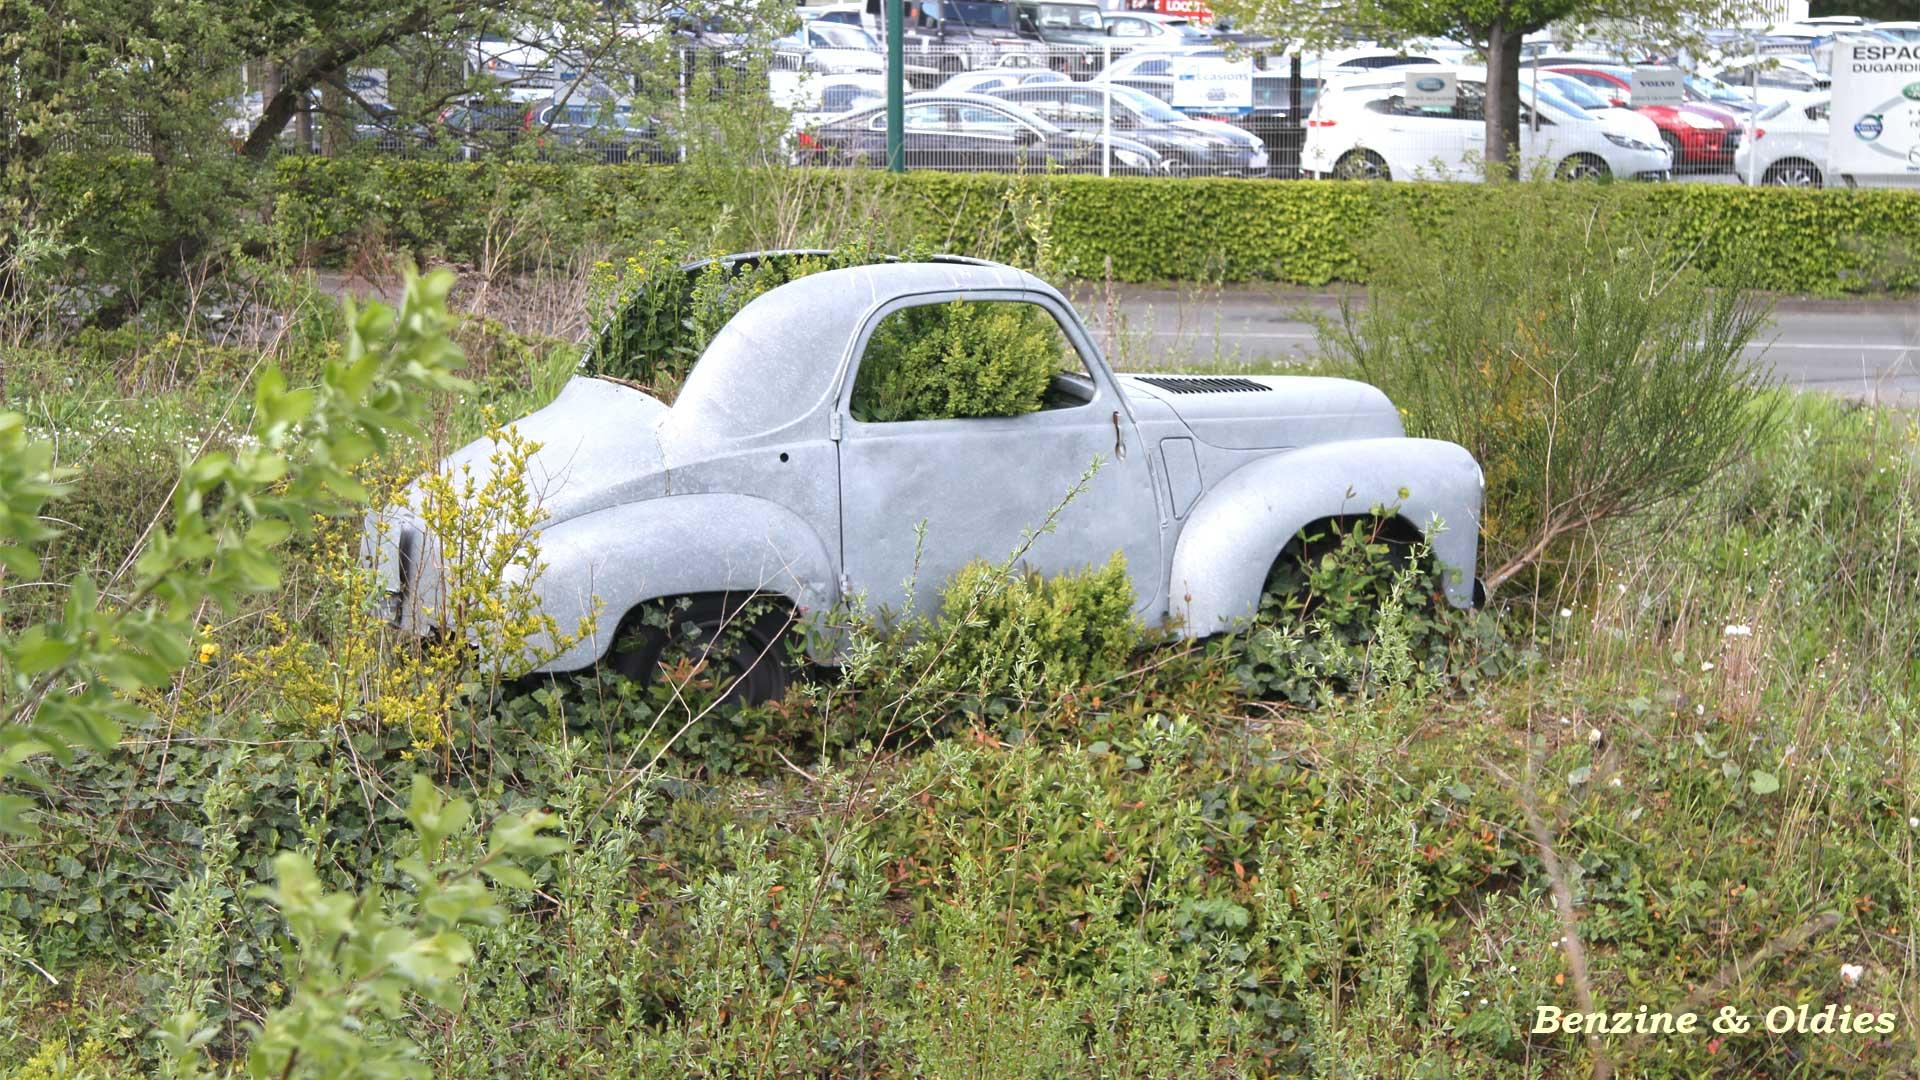 une Simca 6 carrosserie aluminium oubliée dans la nature - Simca6 773876simca6street25w19201080